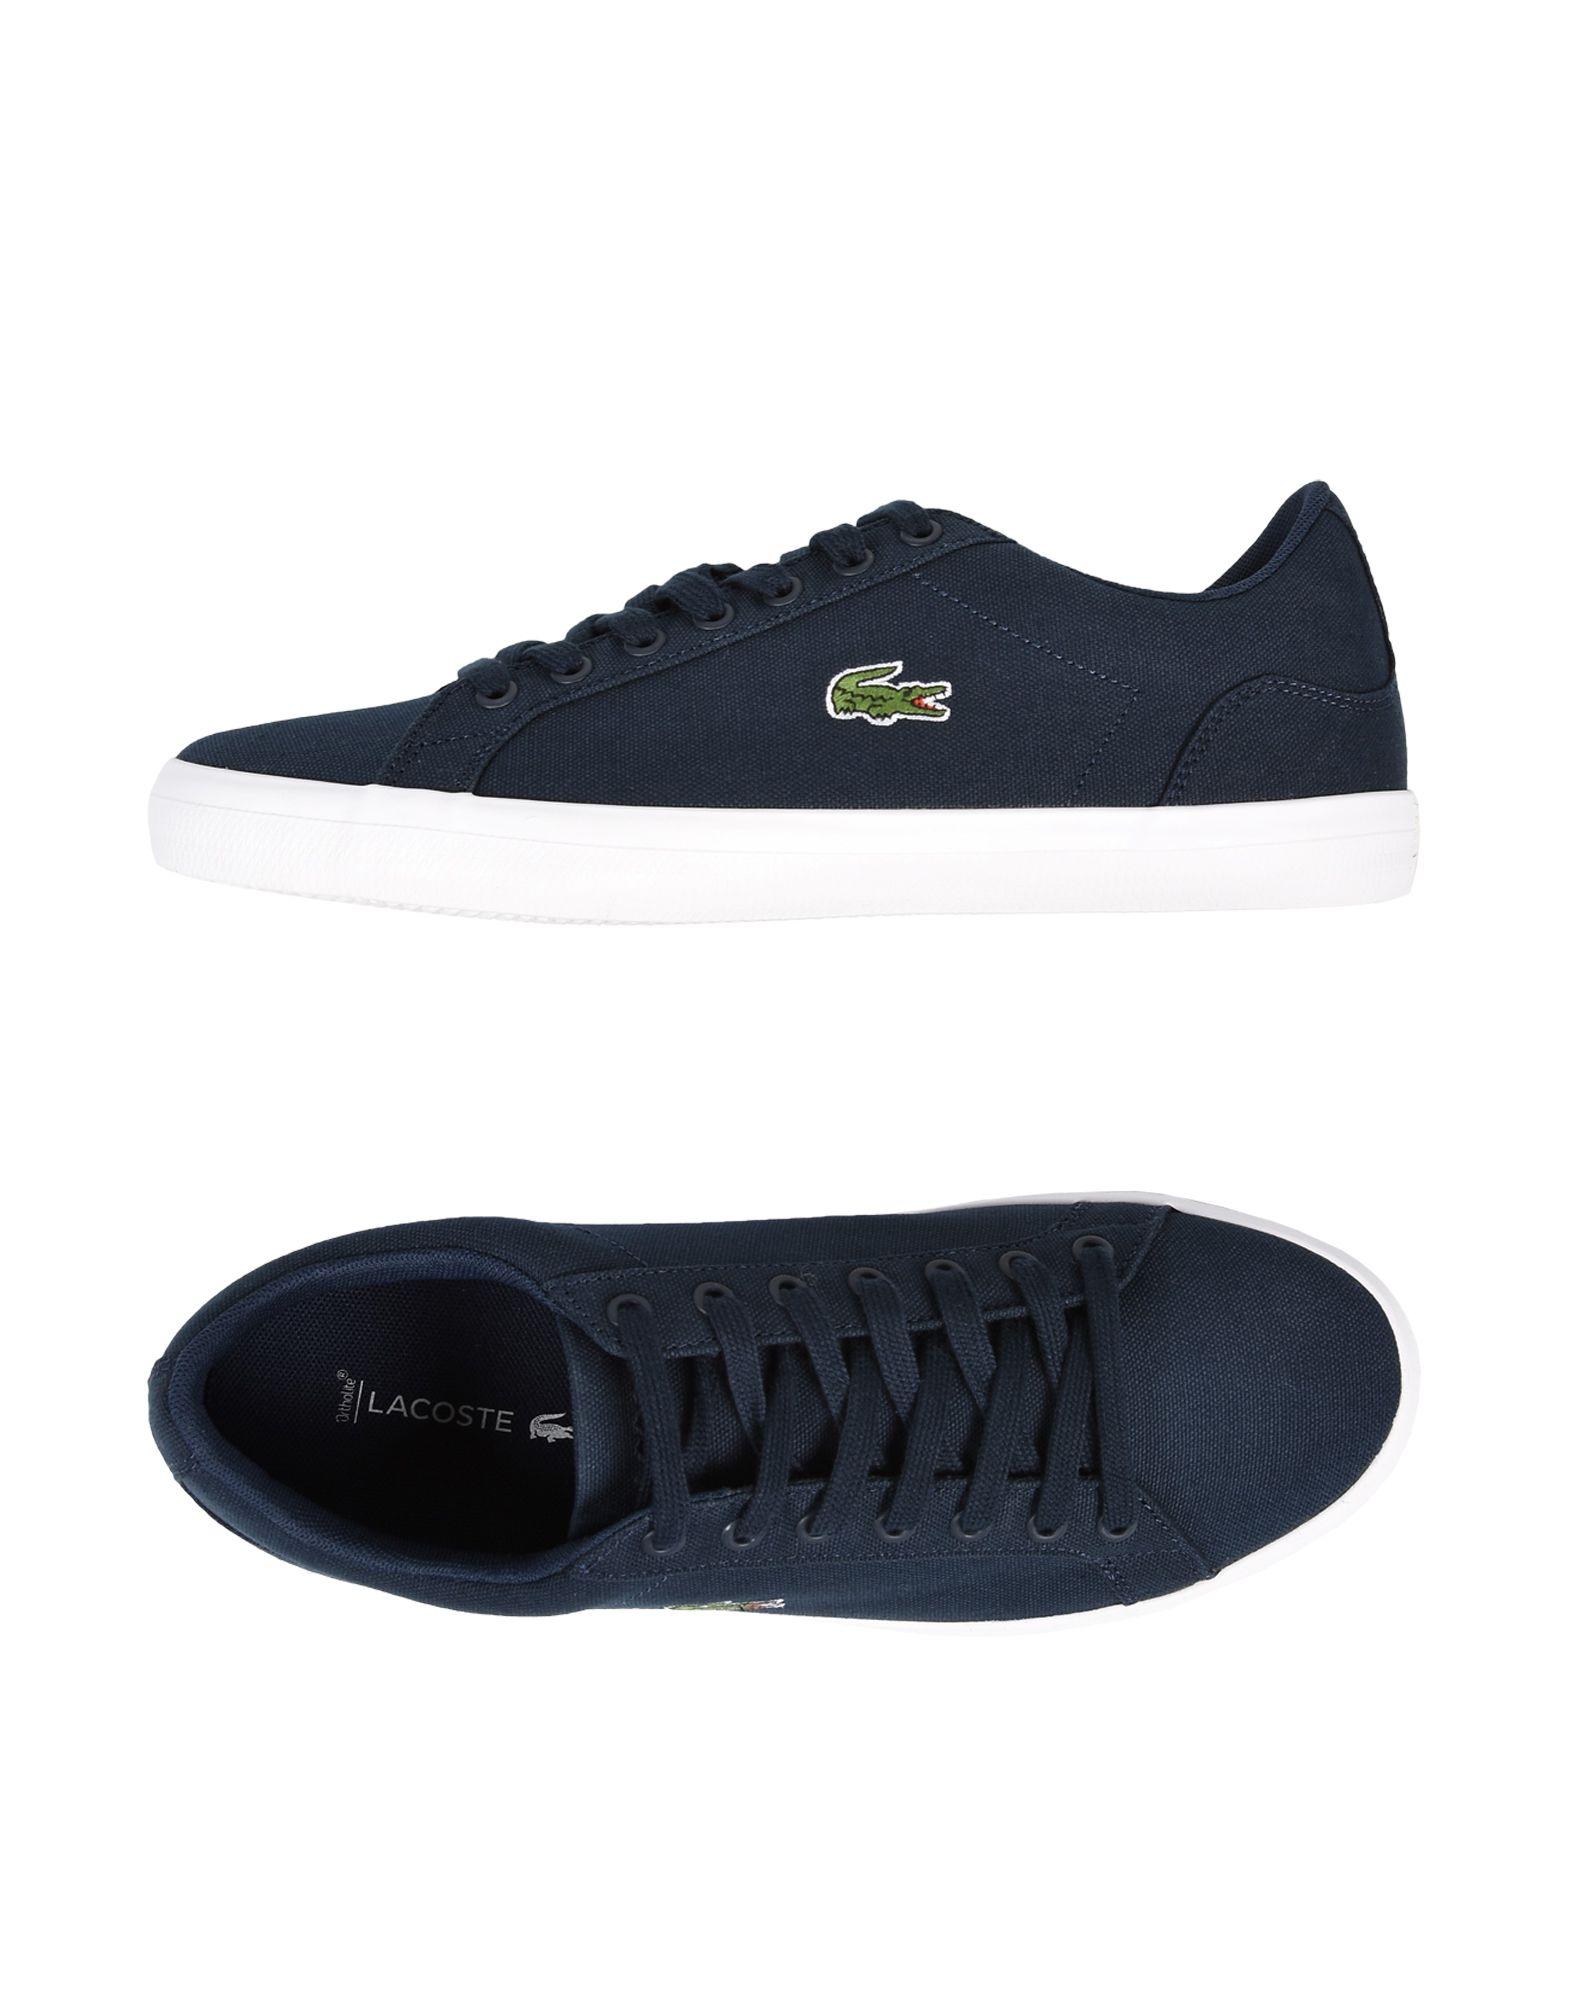 Sneakers Lacoste Lerond Bl 2 - Homme - Sneakers Lacoste sur